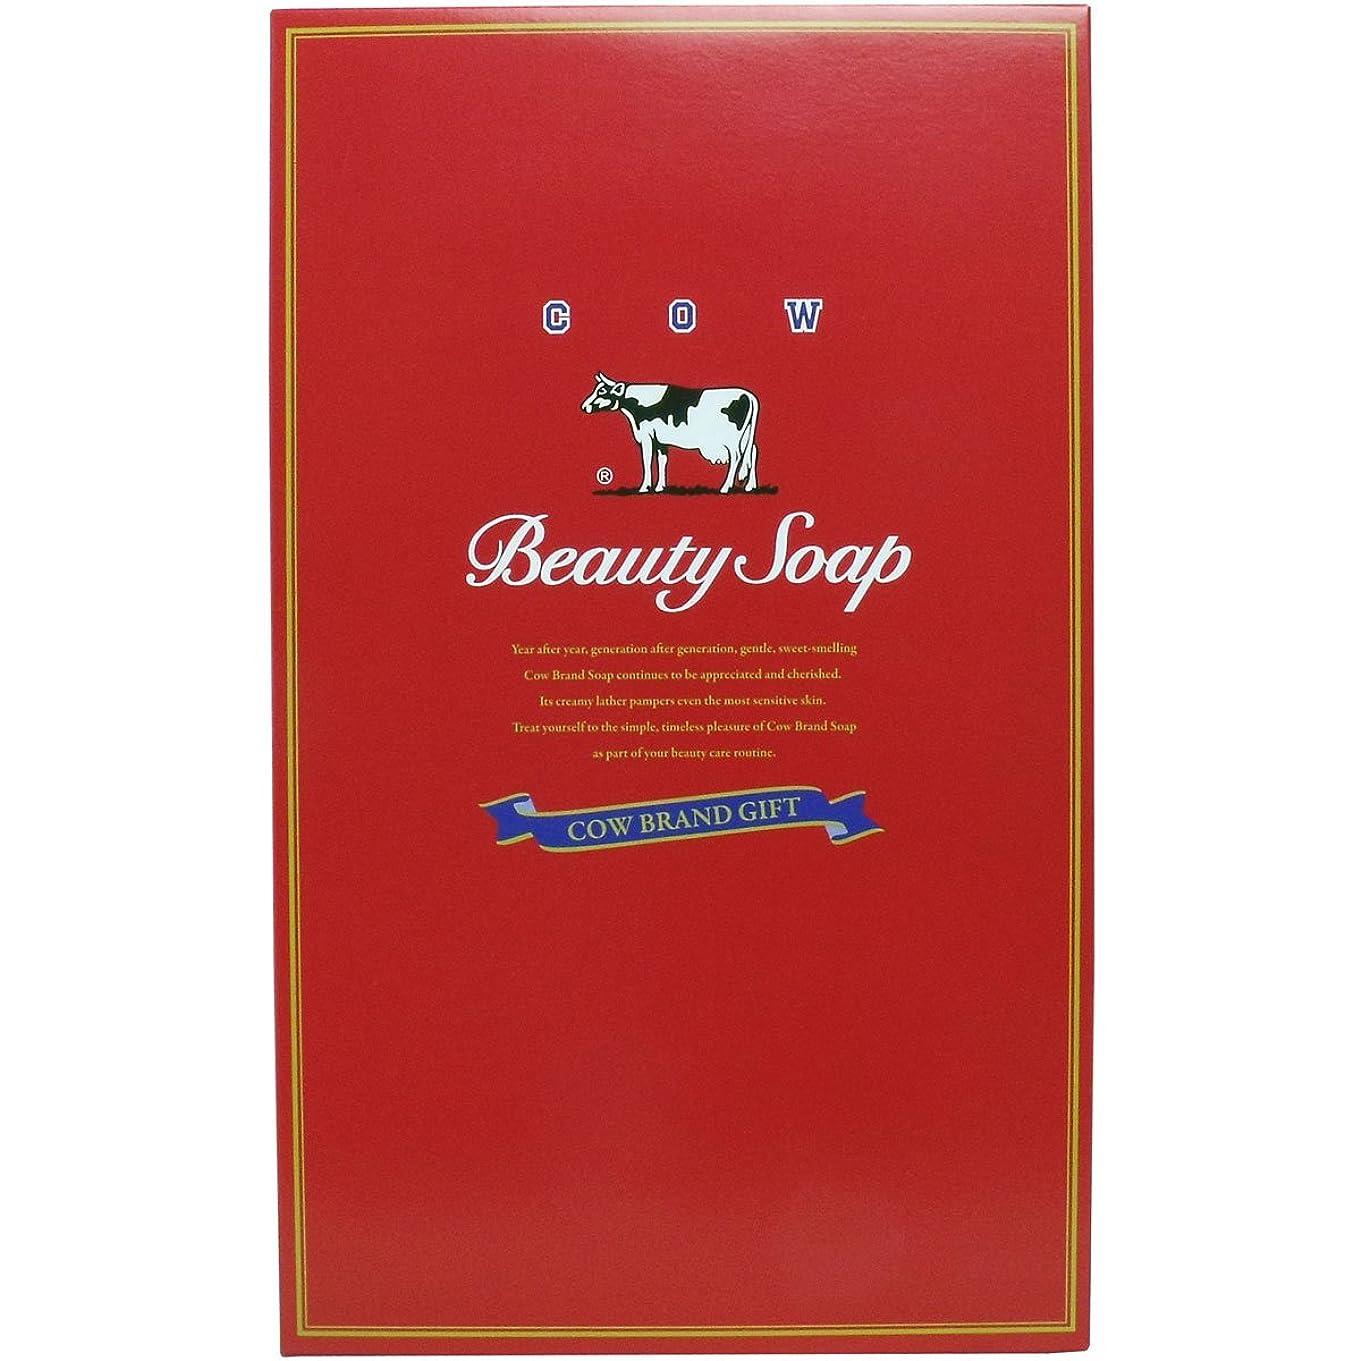 雄弁な人事因子牛乳石鹸共進社 カウブランド石鹸 赤箱 100g×10個×3箱